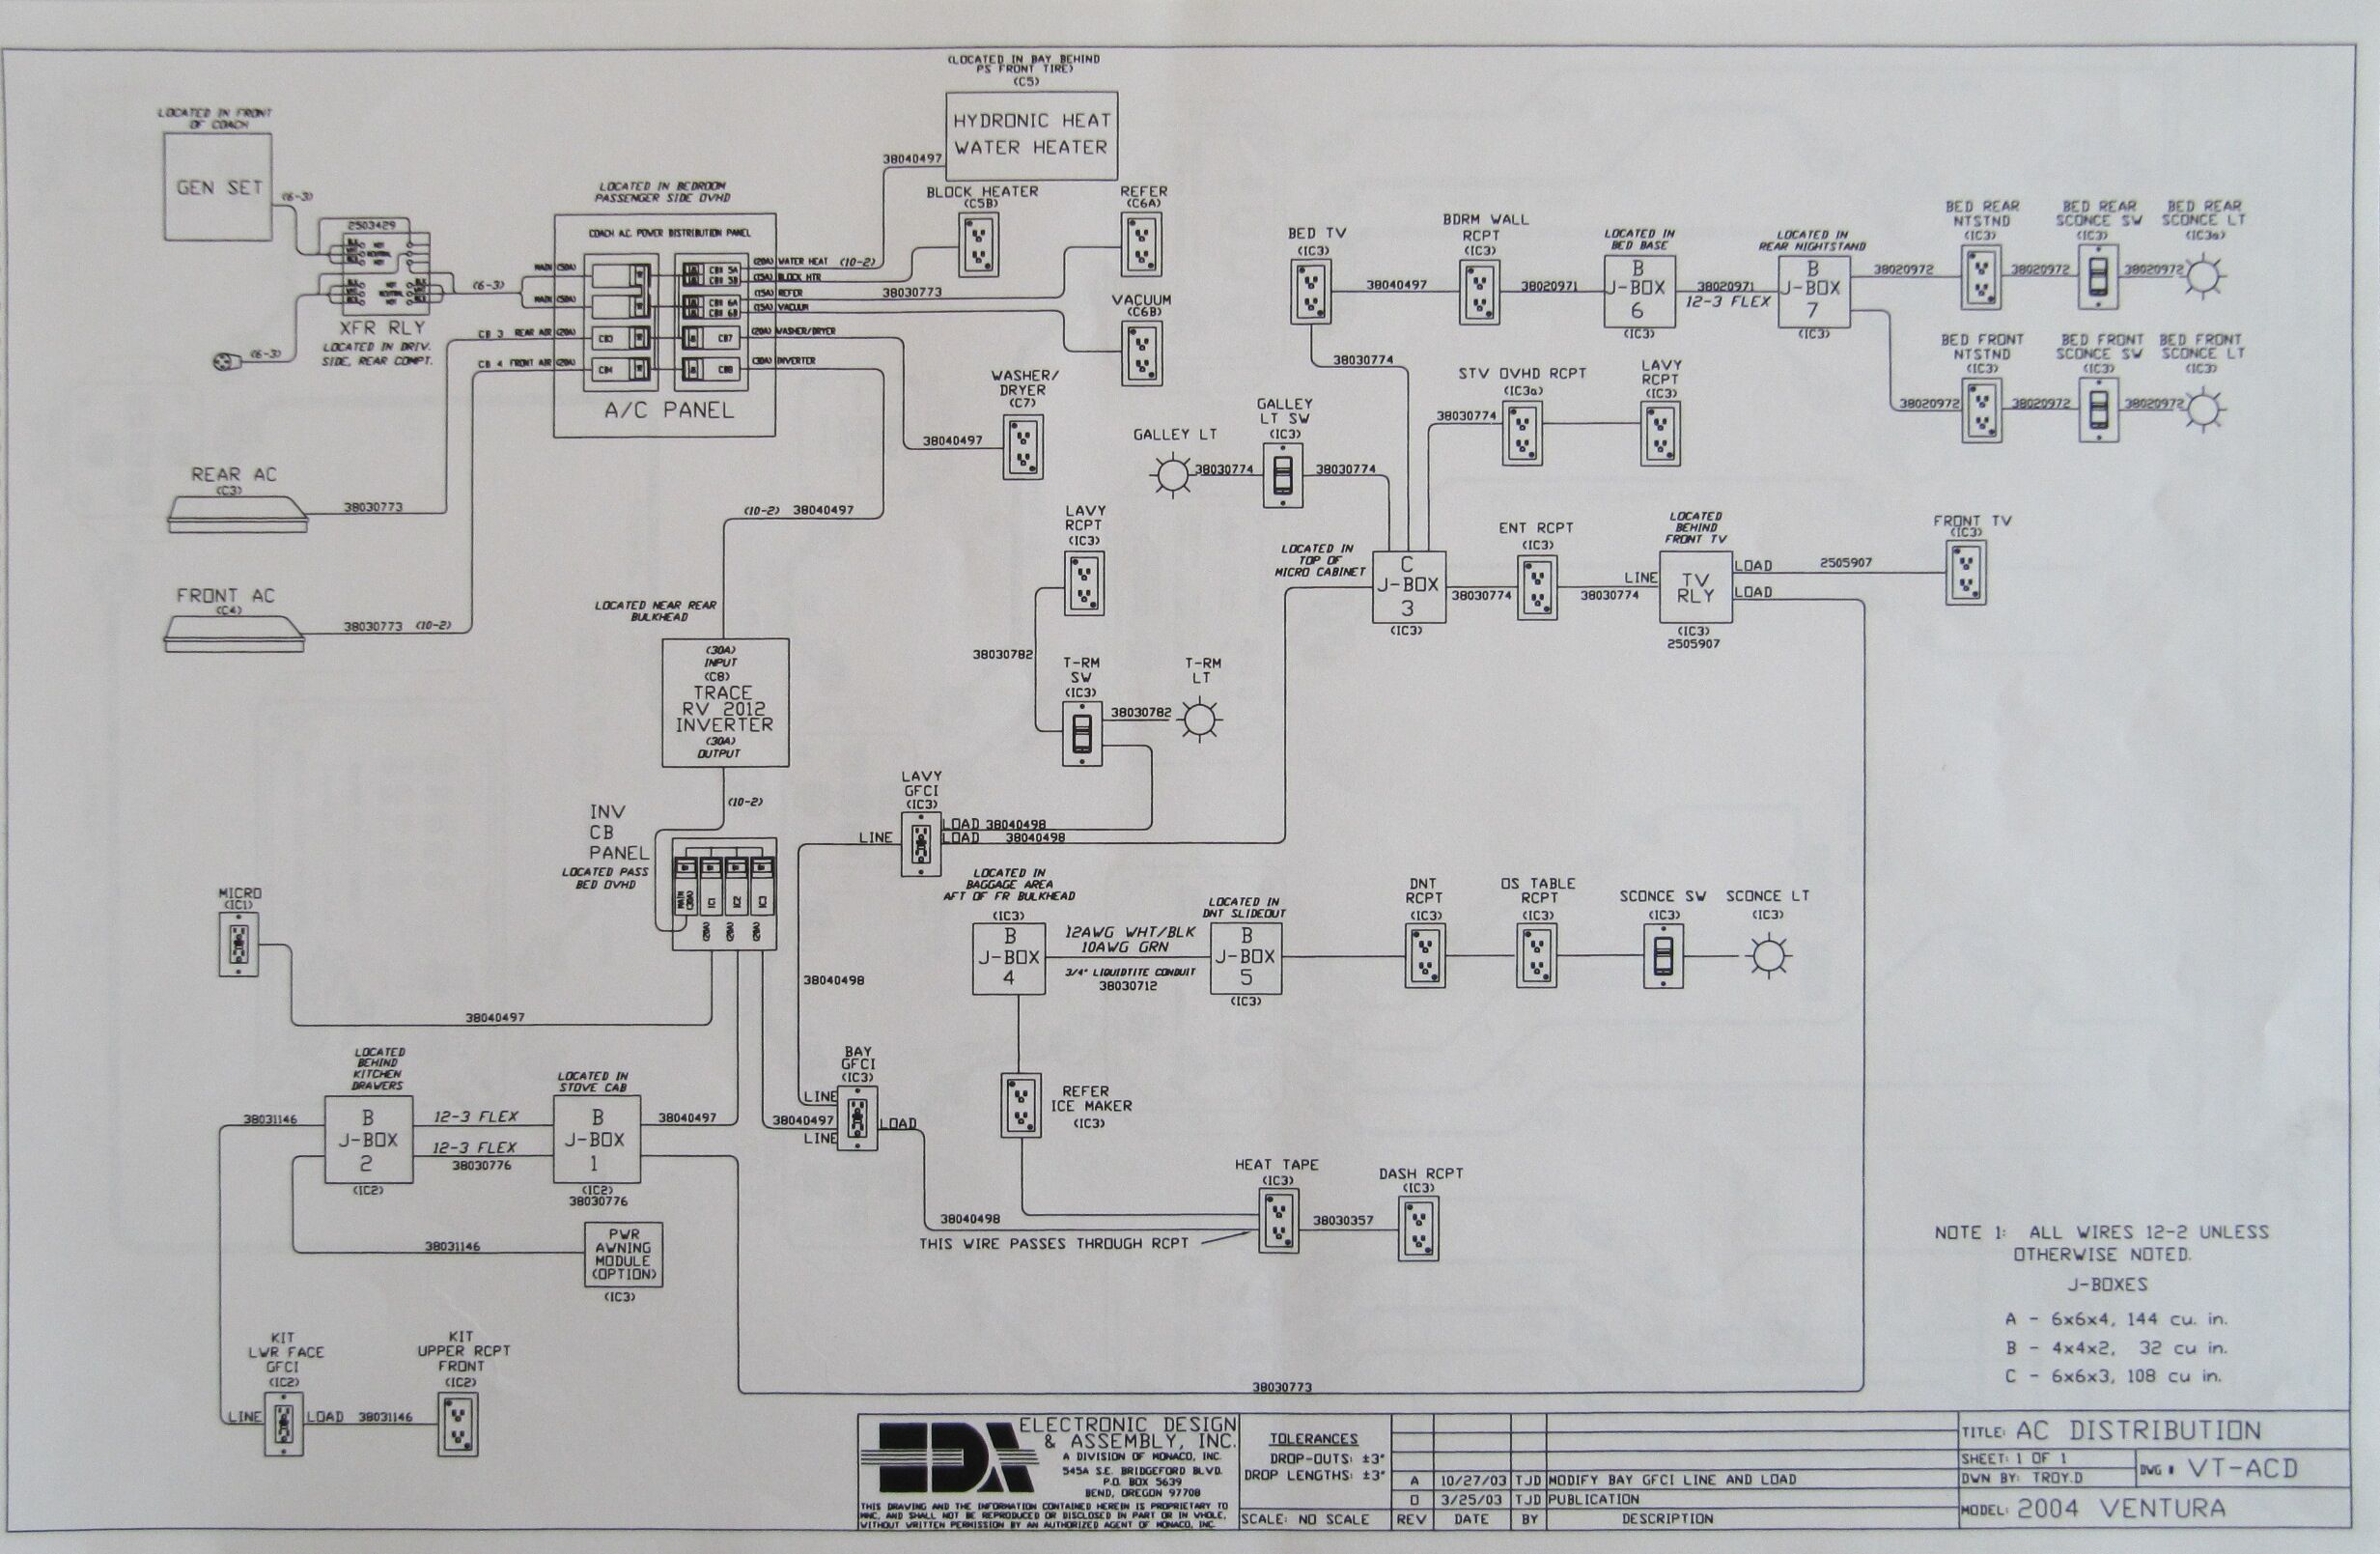 HL_3079] Beaver Motorhome Wiring Diagram Free Diagram   Spartan Wiring Diagrams      Xlexi Abole Phan Gious Sequ Diog Ginou Pelap Elec Mohammedshrine Librar  Wiring 101